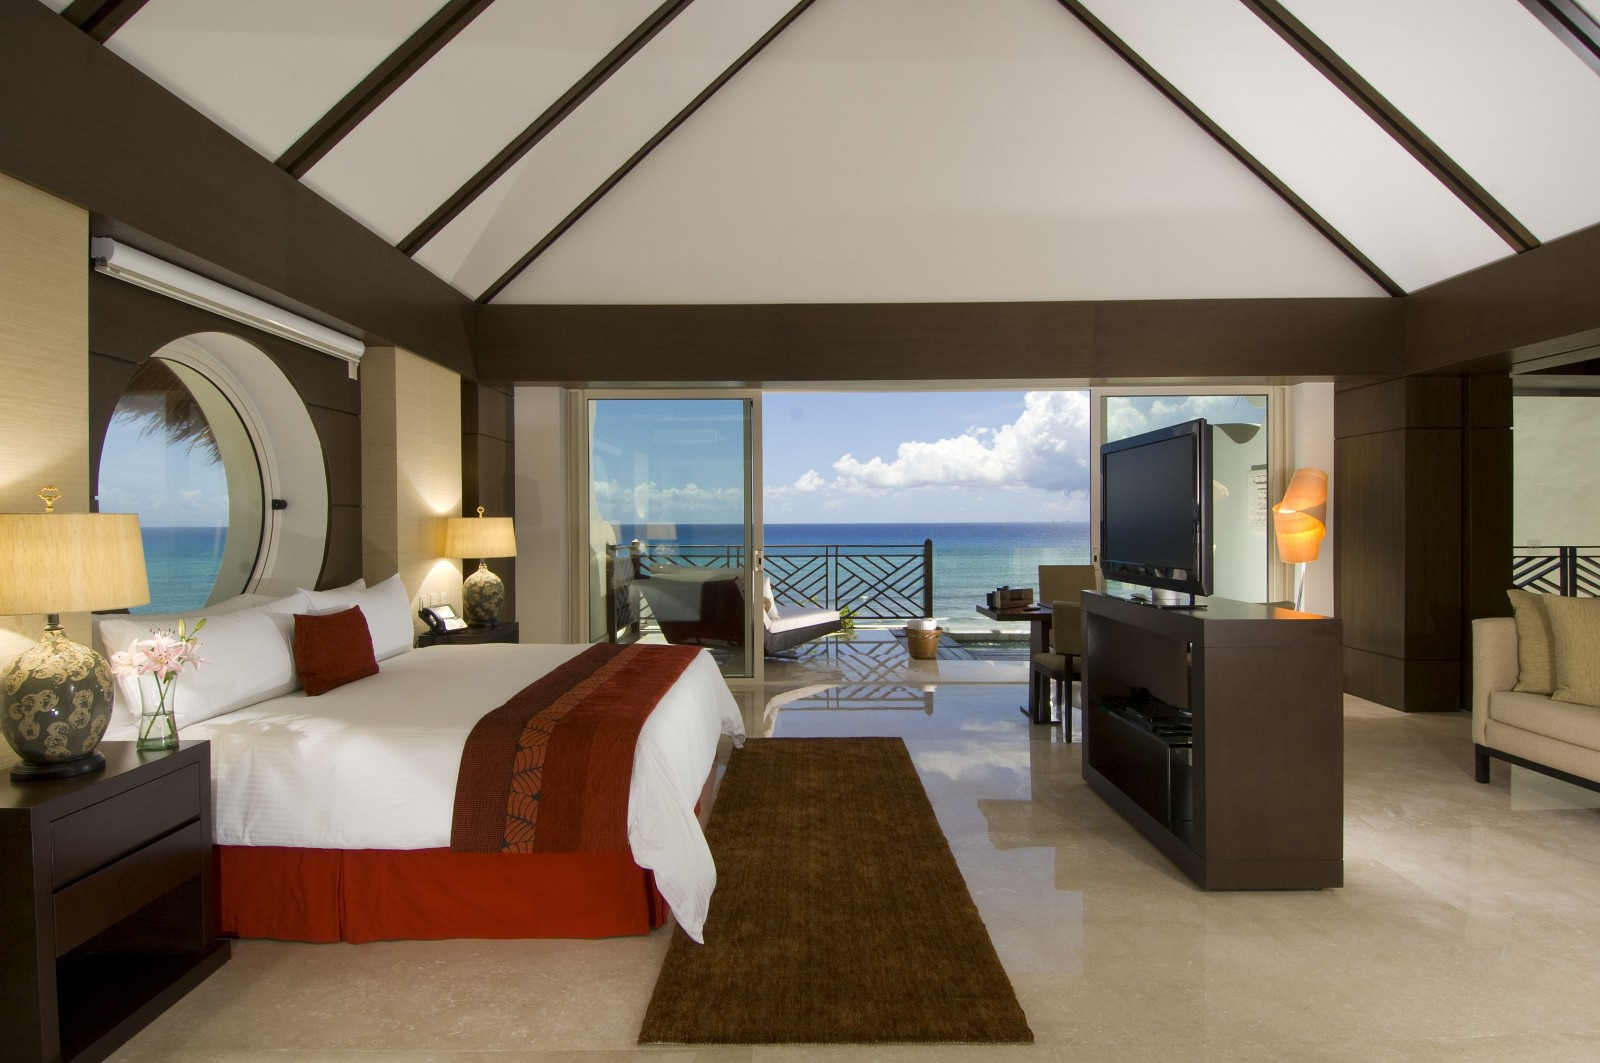 Travel Agency All-Inclusive Resort Grand Velas Riviera Maya 024